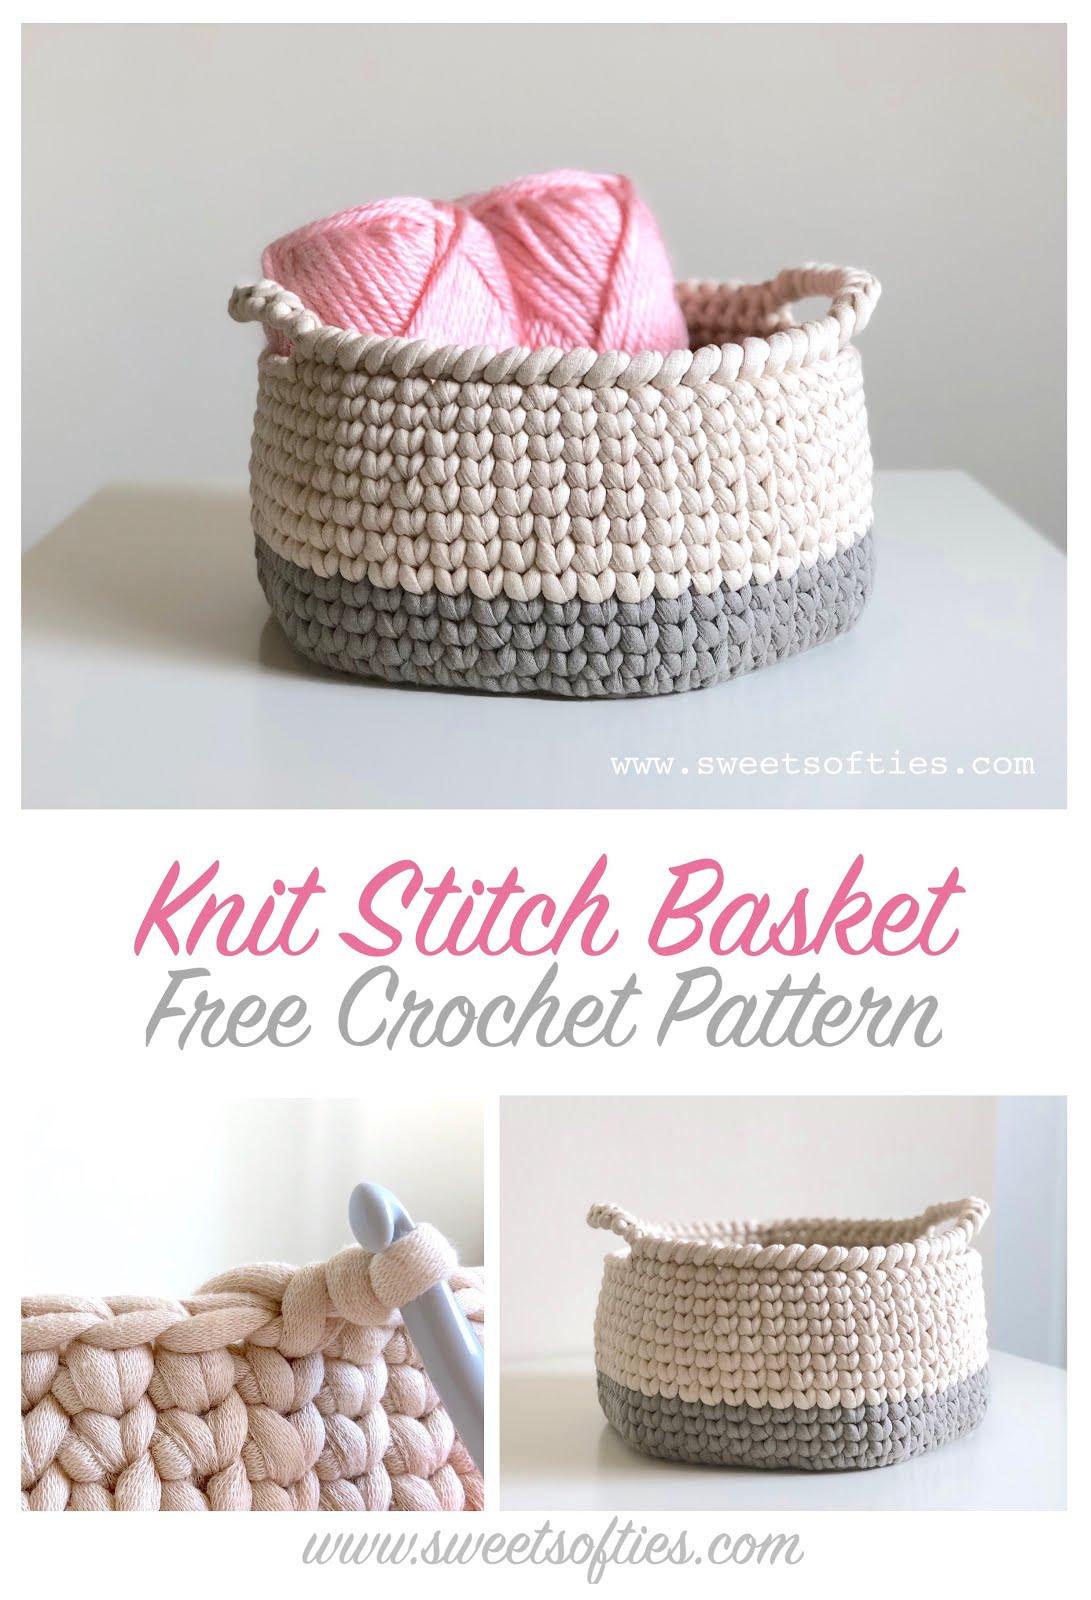 Knit Stitch Basket Free Crochet Pattern Video Tutorials For